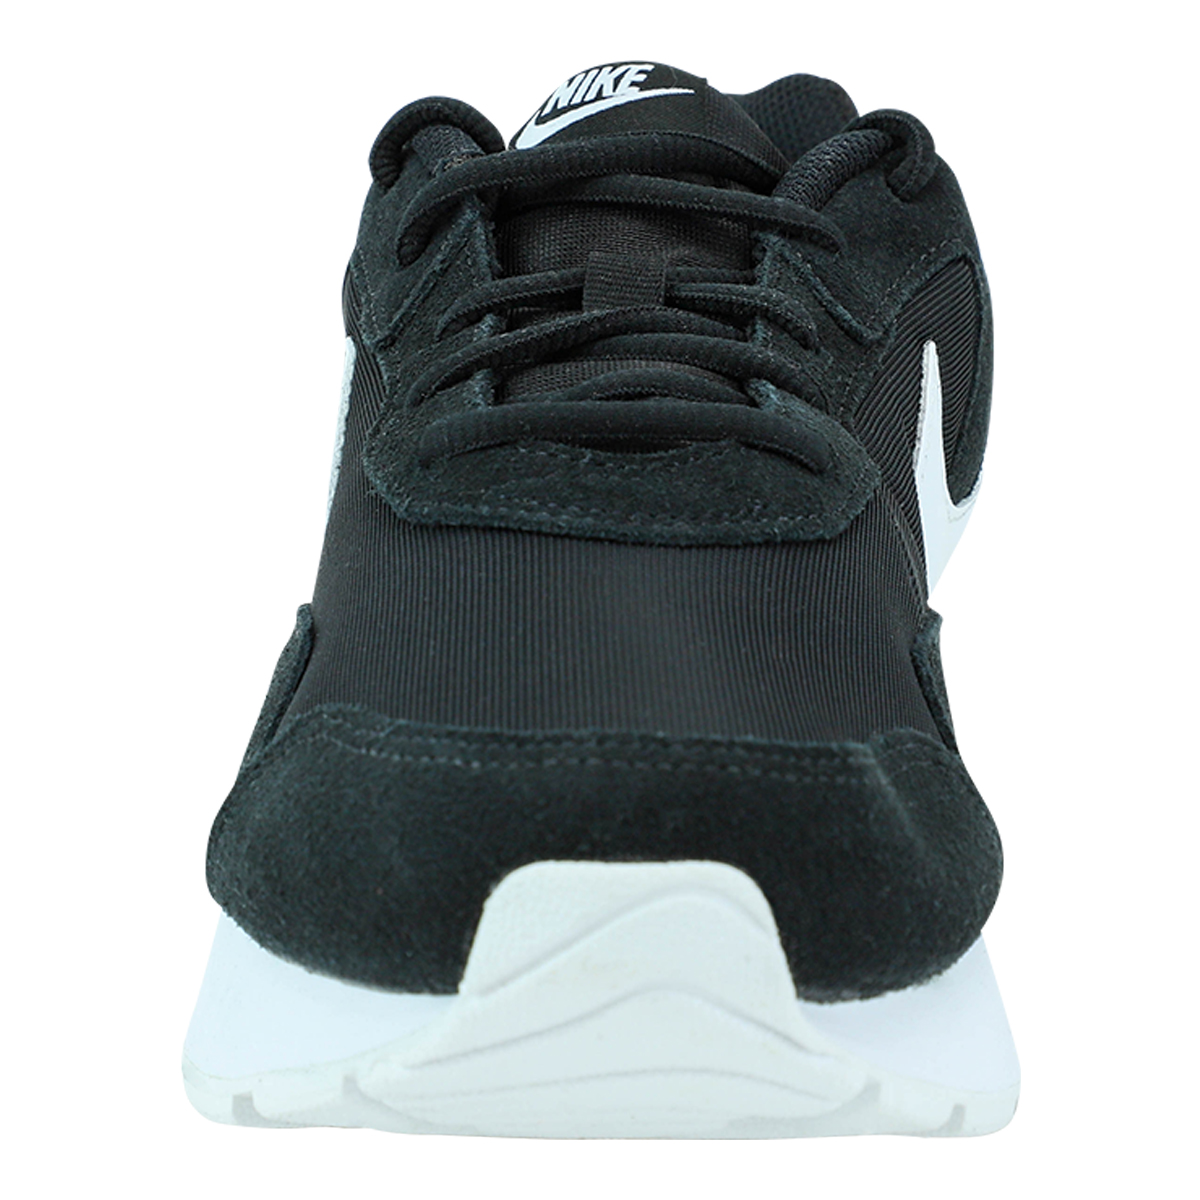 Nike-Men-039-s-Delfine-Running-Shoes thumbnail 11